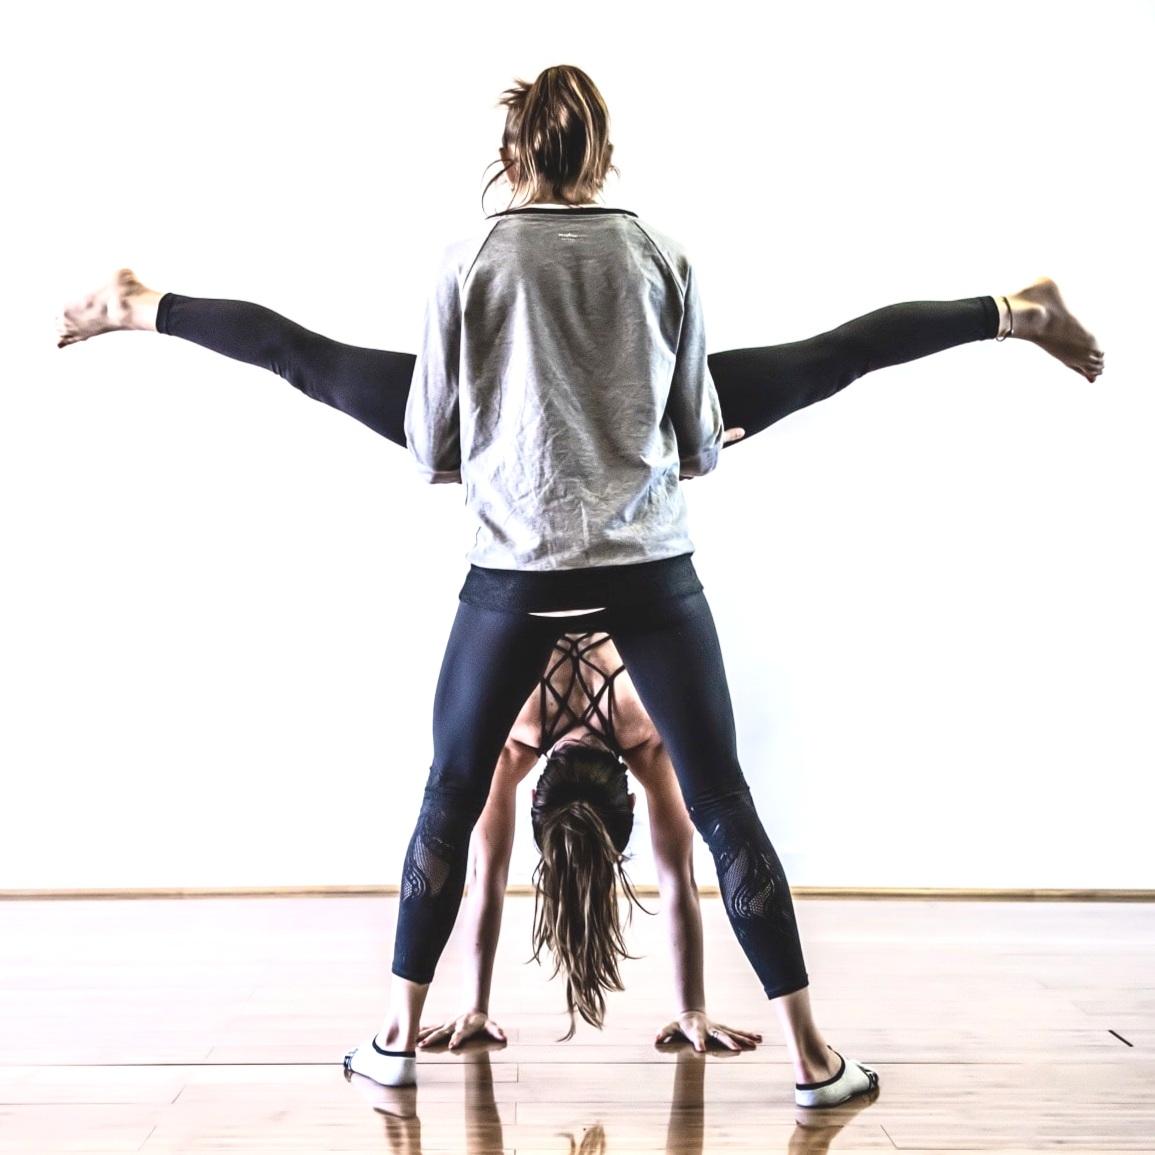 www.powerandposture.com_yoga_arm balances_min (25).jpeg